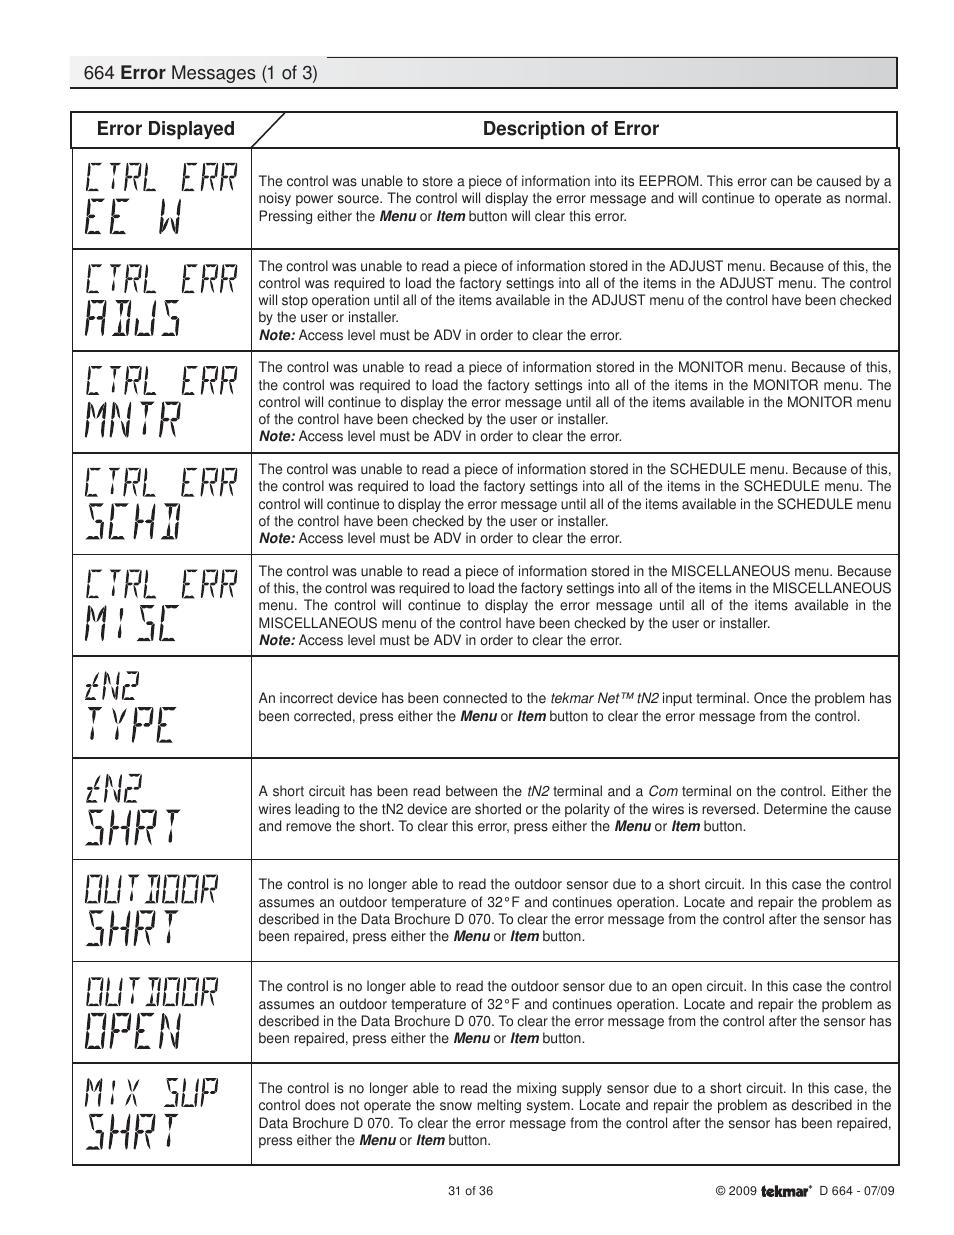 Error Displayed Description Of Tekmar 664 Snow Detector Short Circuit Melting Control Installation User Manual Page 31 36